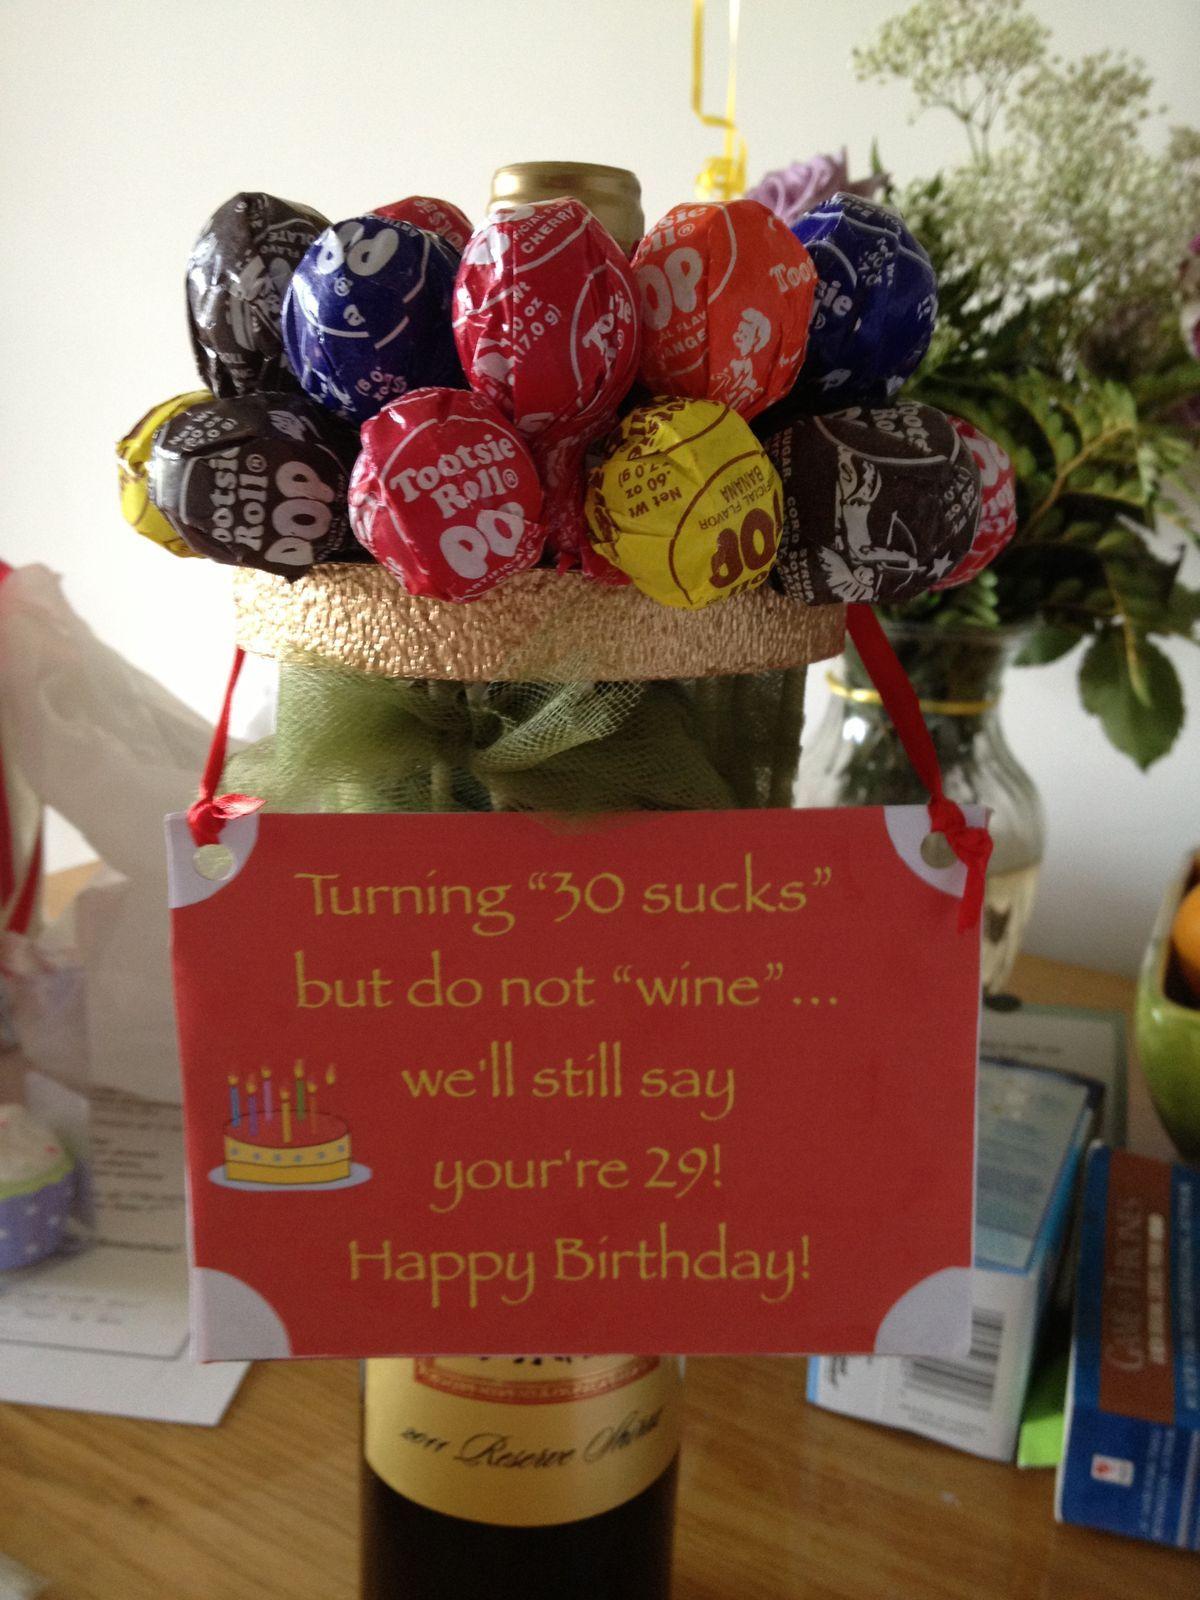 60th birthday and birthdays on pinterest suprise gift